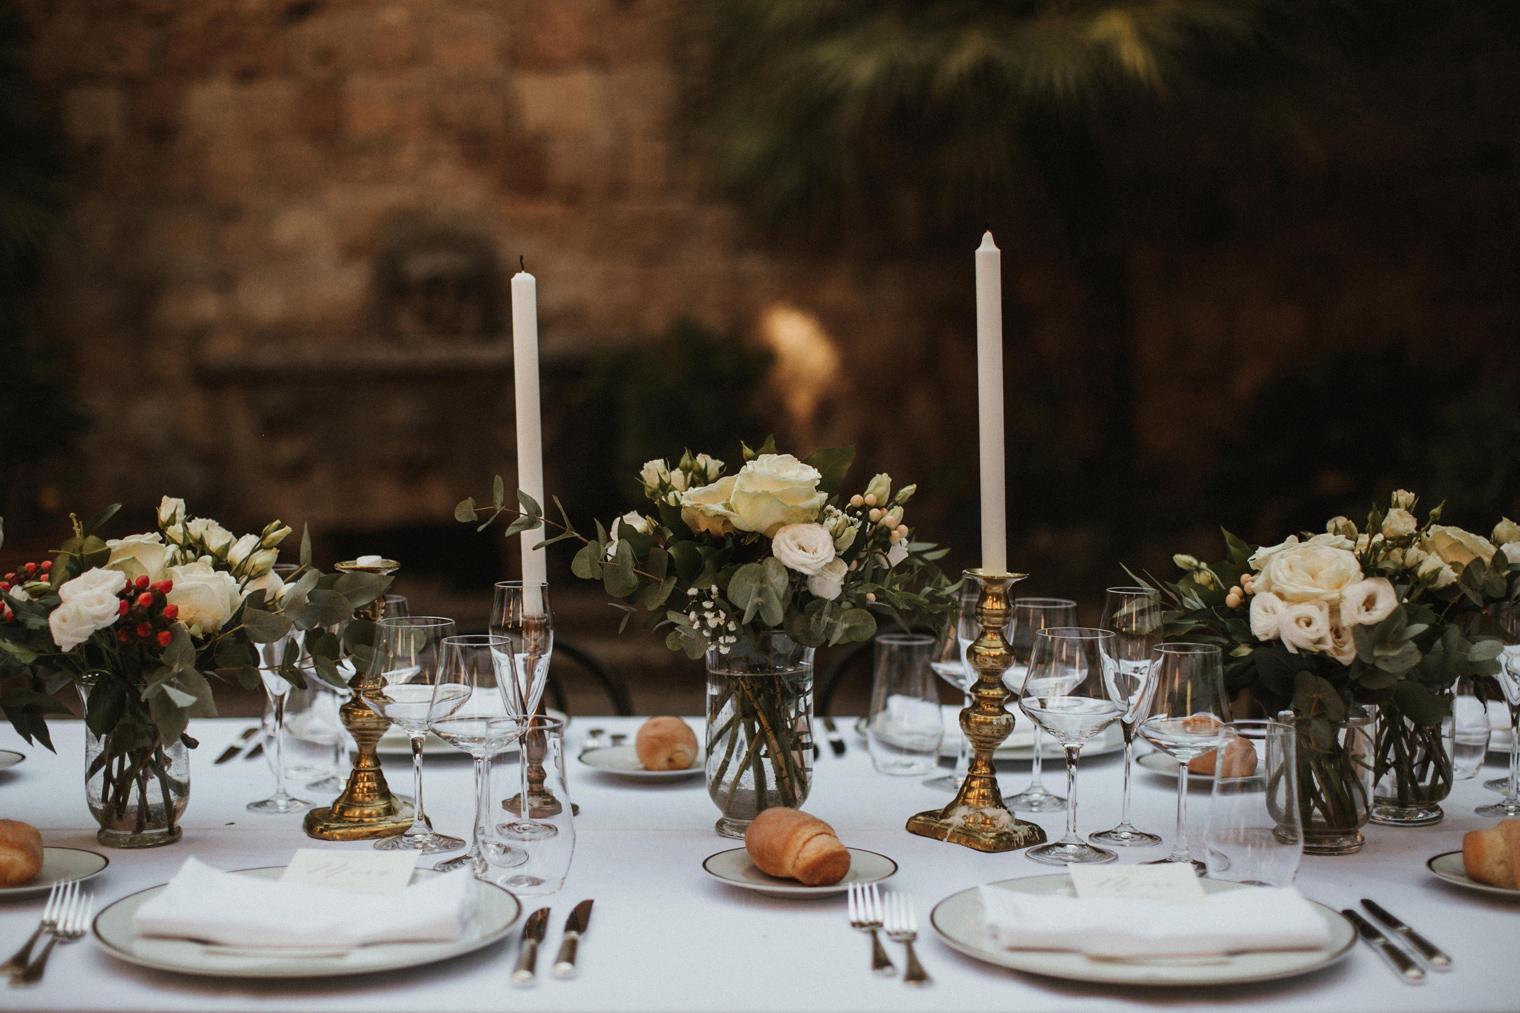 Dinner reception in Italy